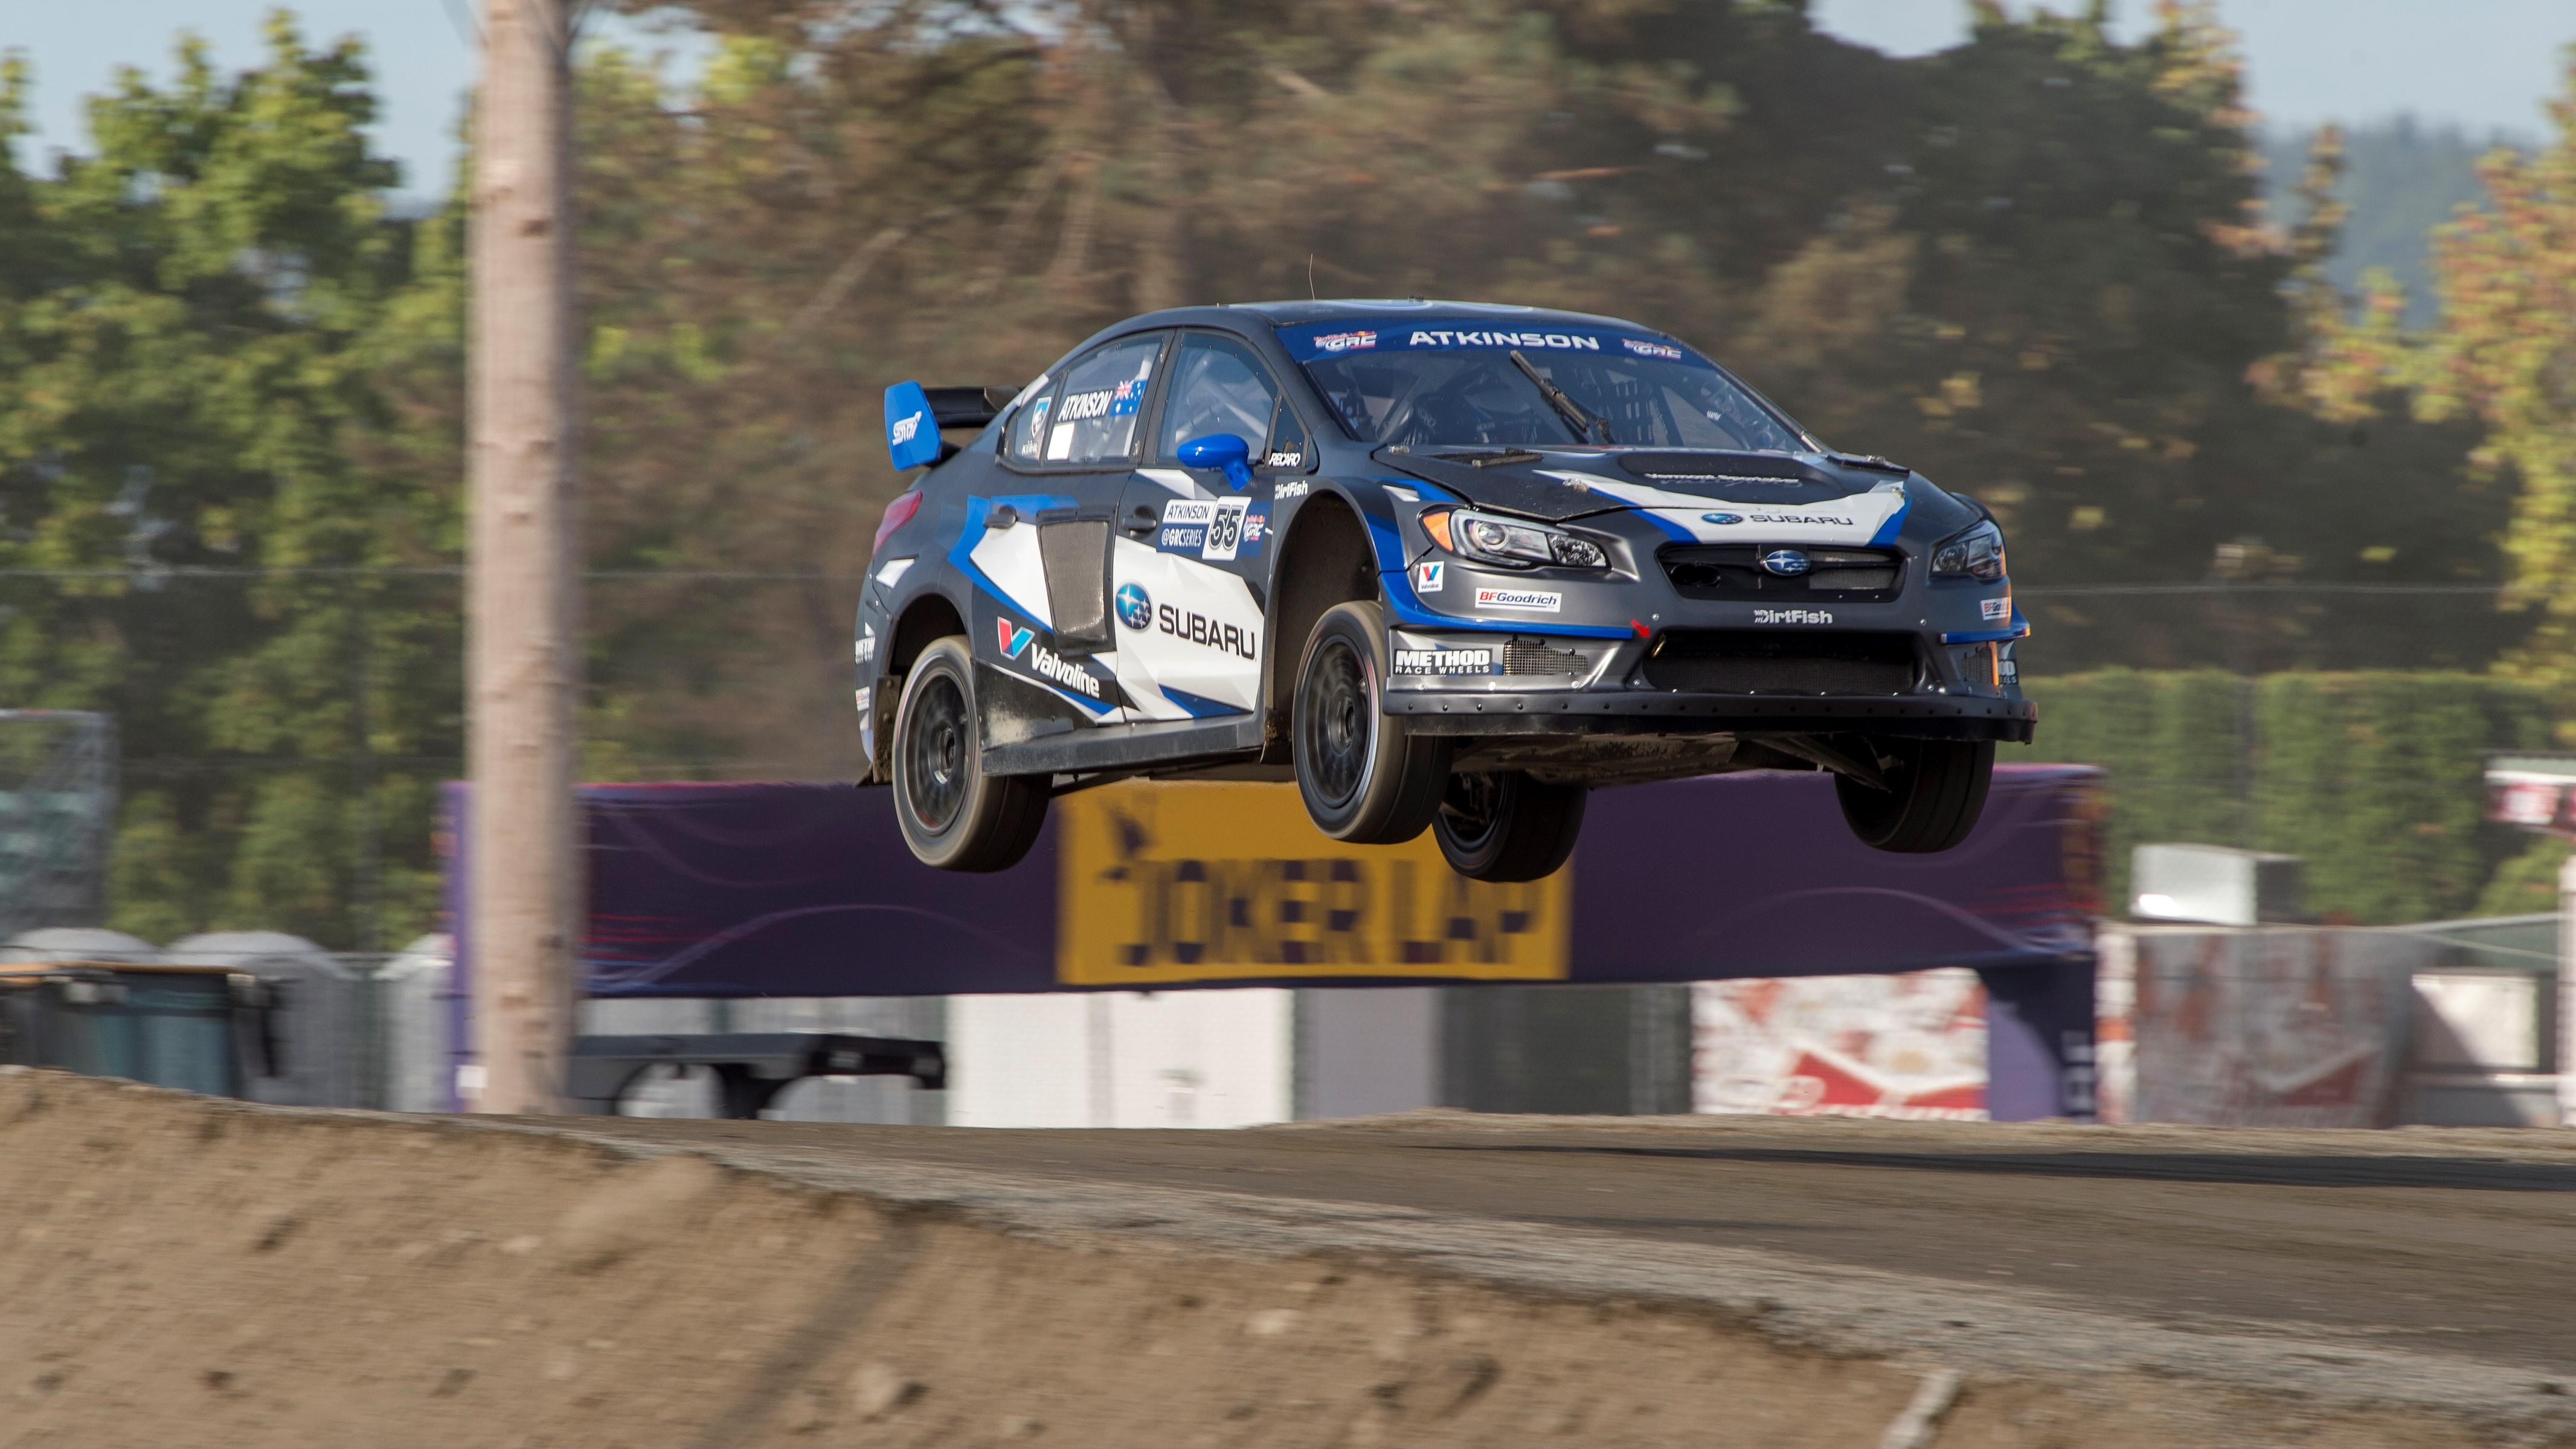 Australia's Chris Atkinson flies high in his Subau WRX STI rallycross car.